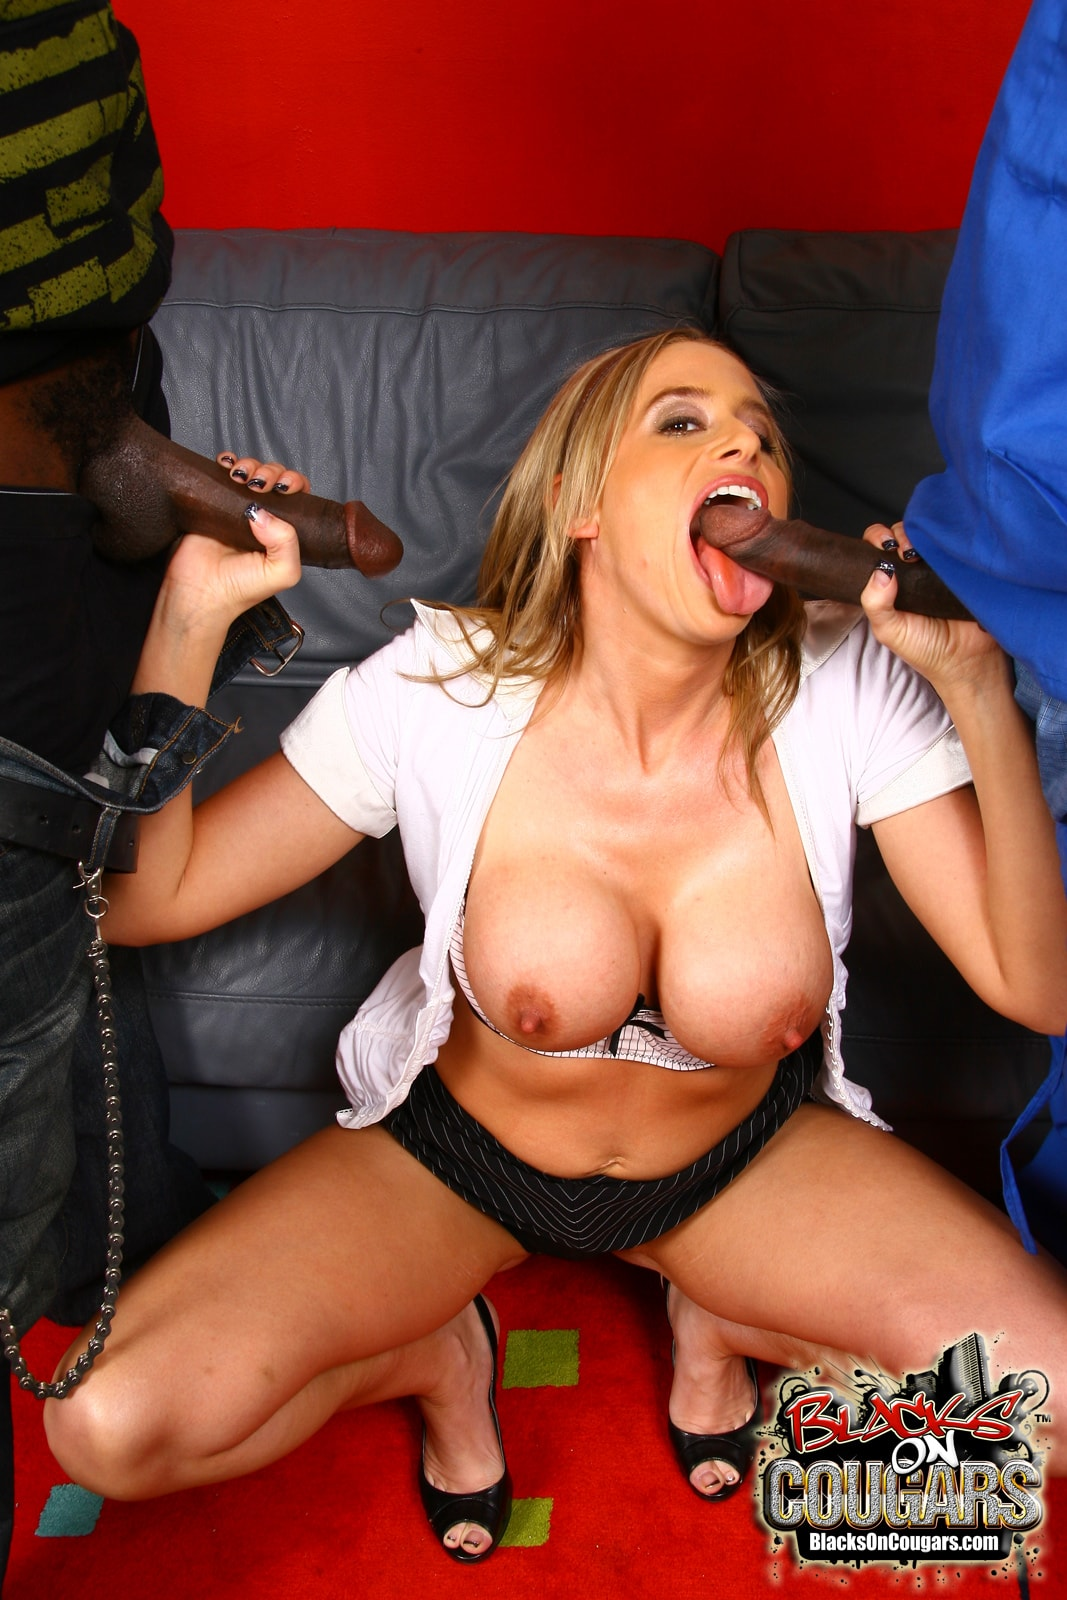 Dogfart '- Blacks On Cougars' starring Kylie Worthy (Photo 11)